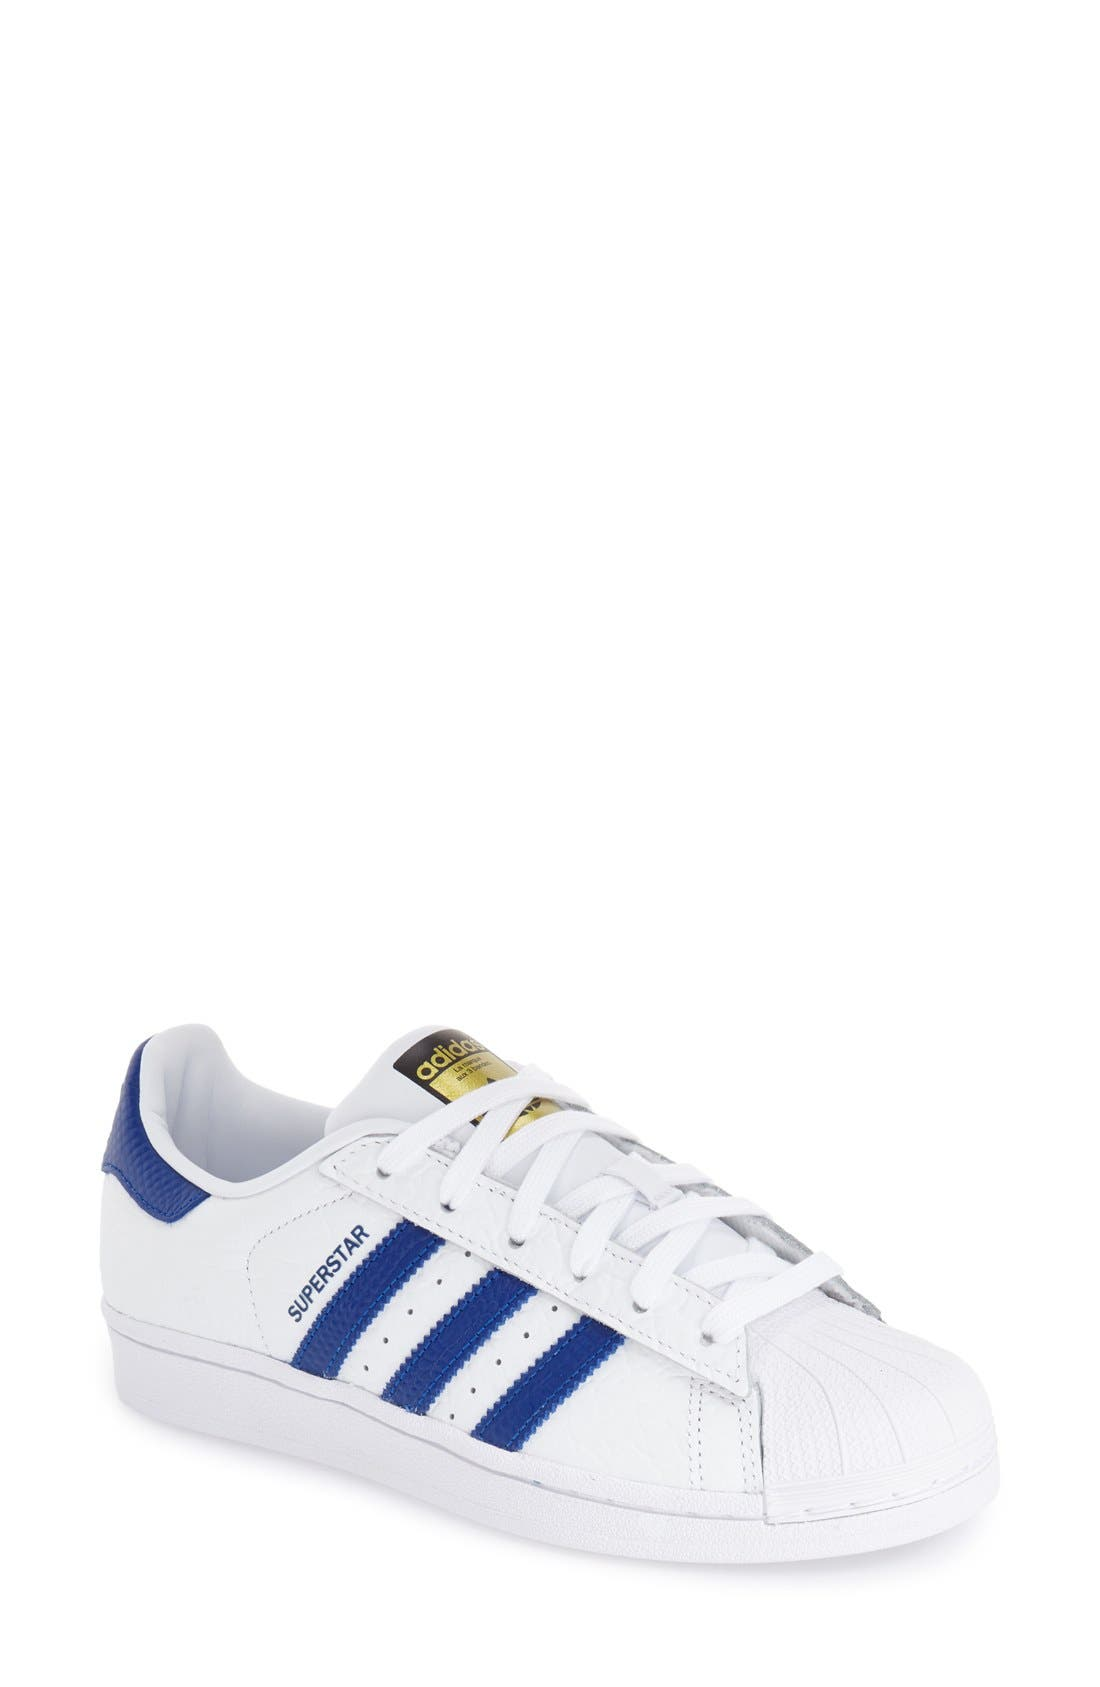 Alternate Image 1 Selected - adidas 'Superstar' Sneaker (Women)